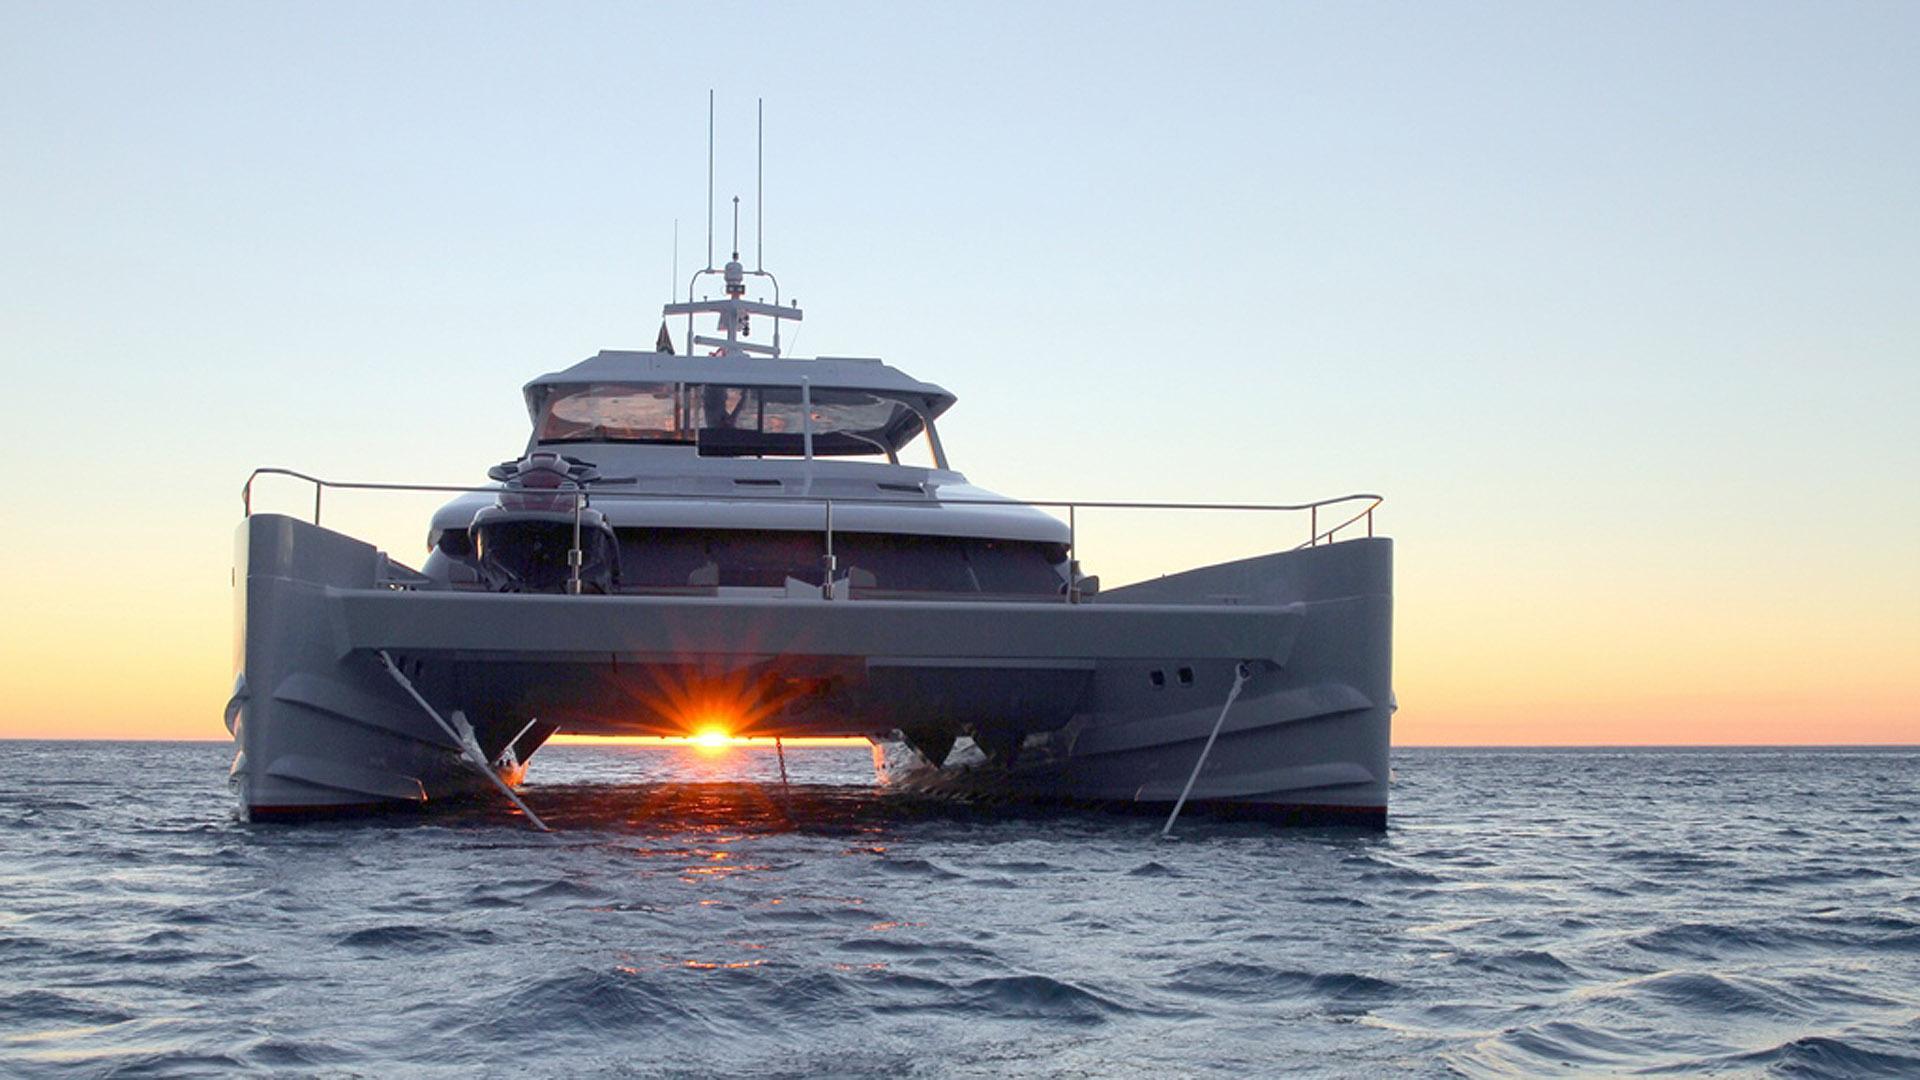 ultra vires catamaran motoryacht two oceans marine 2016 25m bow